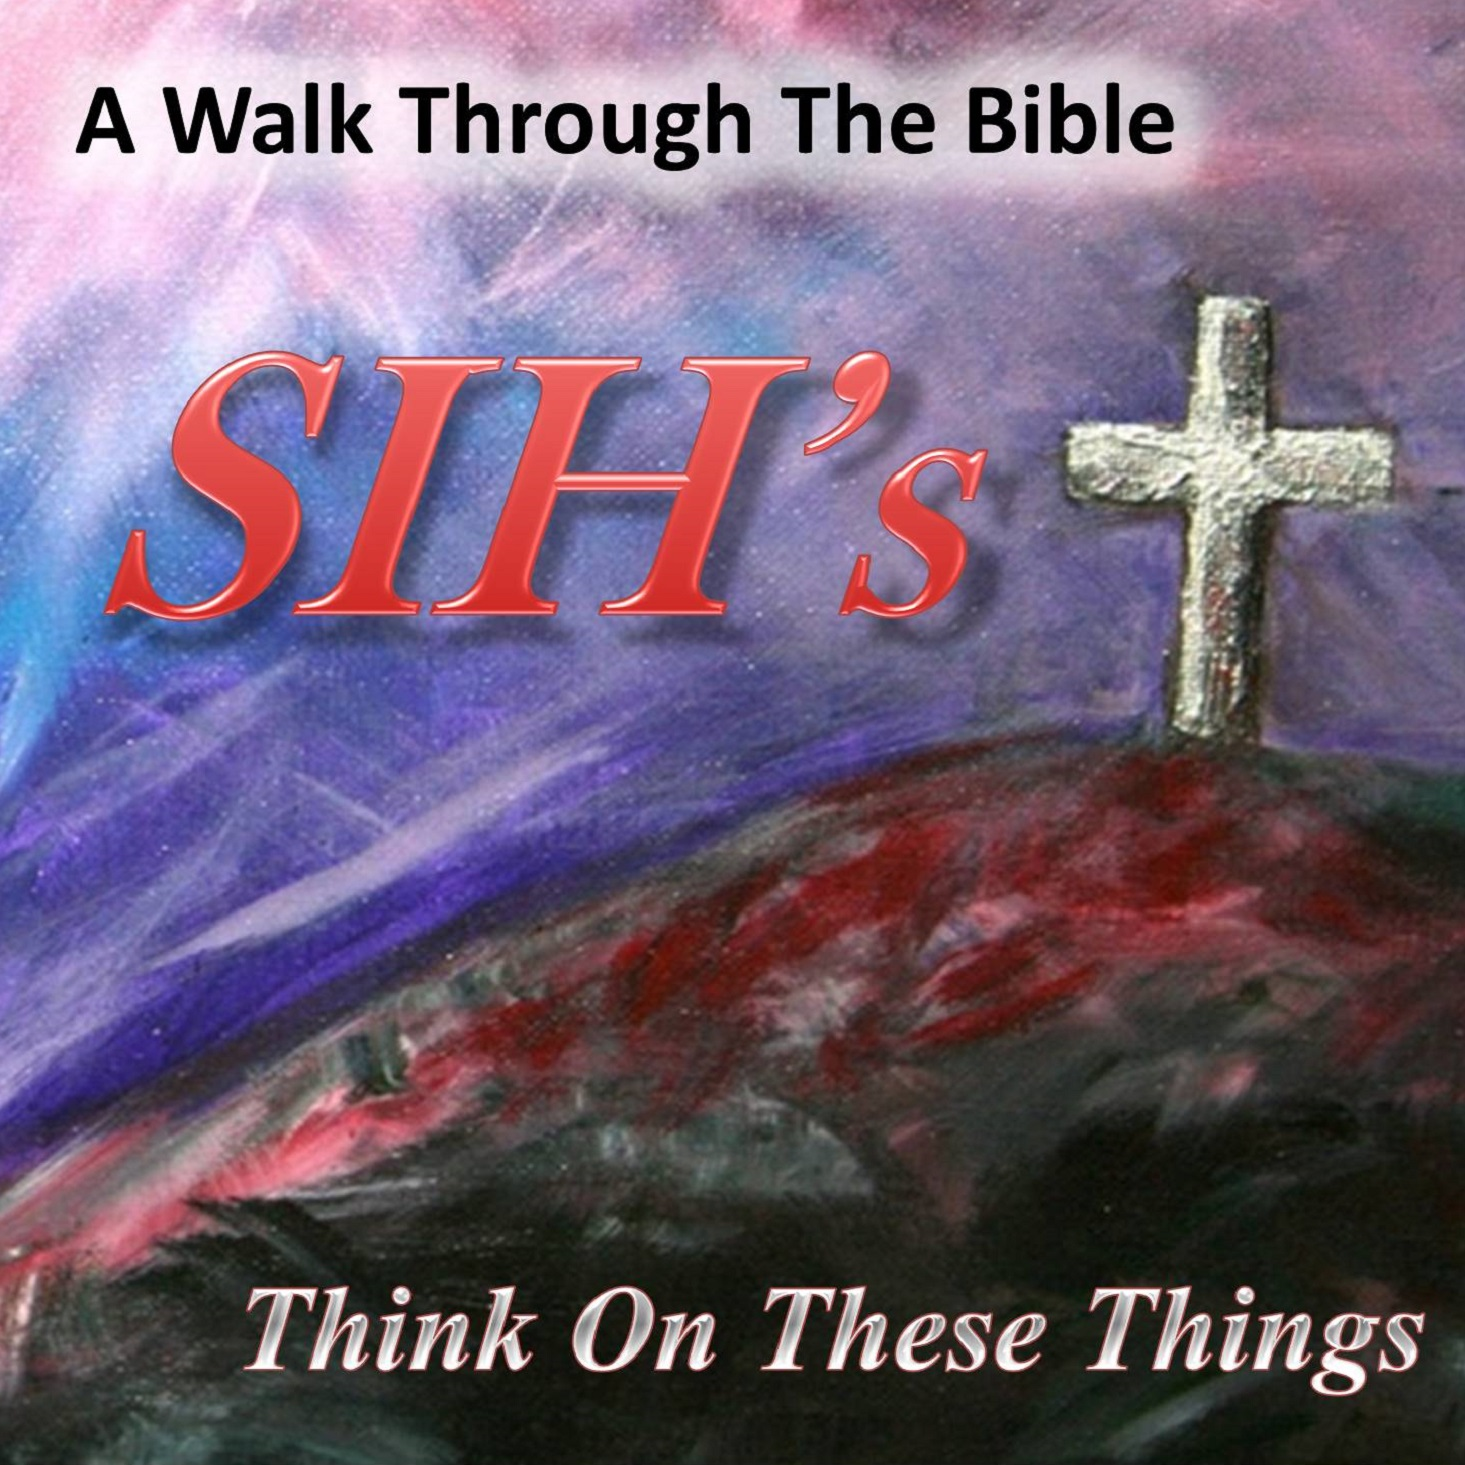 A Walk Through The Bible Genesis 40 Meeting The Needs